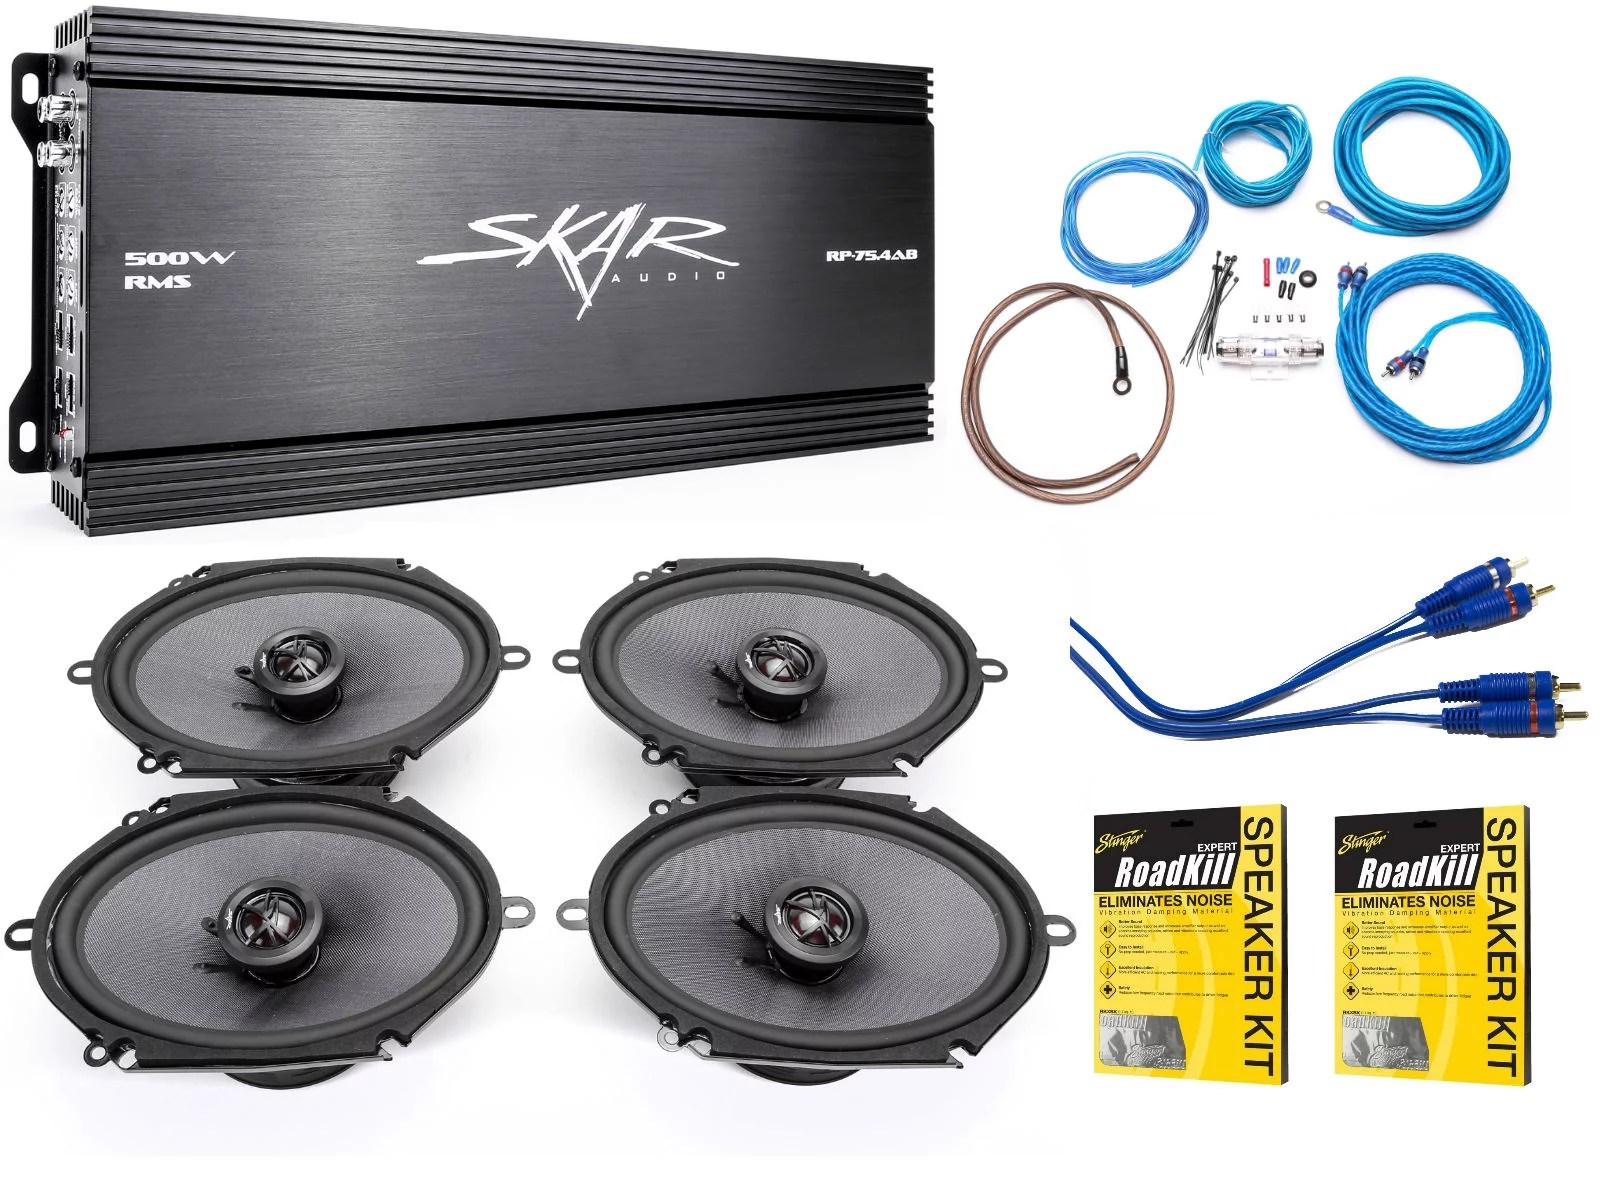 skar audio 6 x8 complete elite speaker upgrade package with skar audio subwoofer wiring diagram skar audio wiring [ 1600 x 1200 Pixel ]